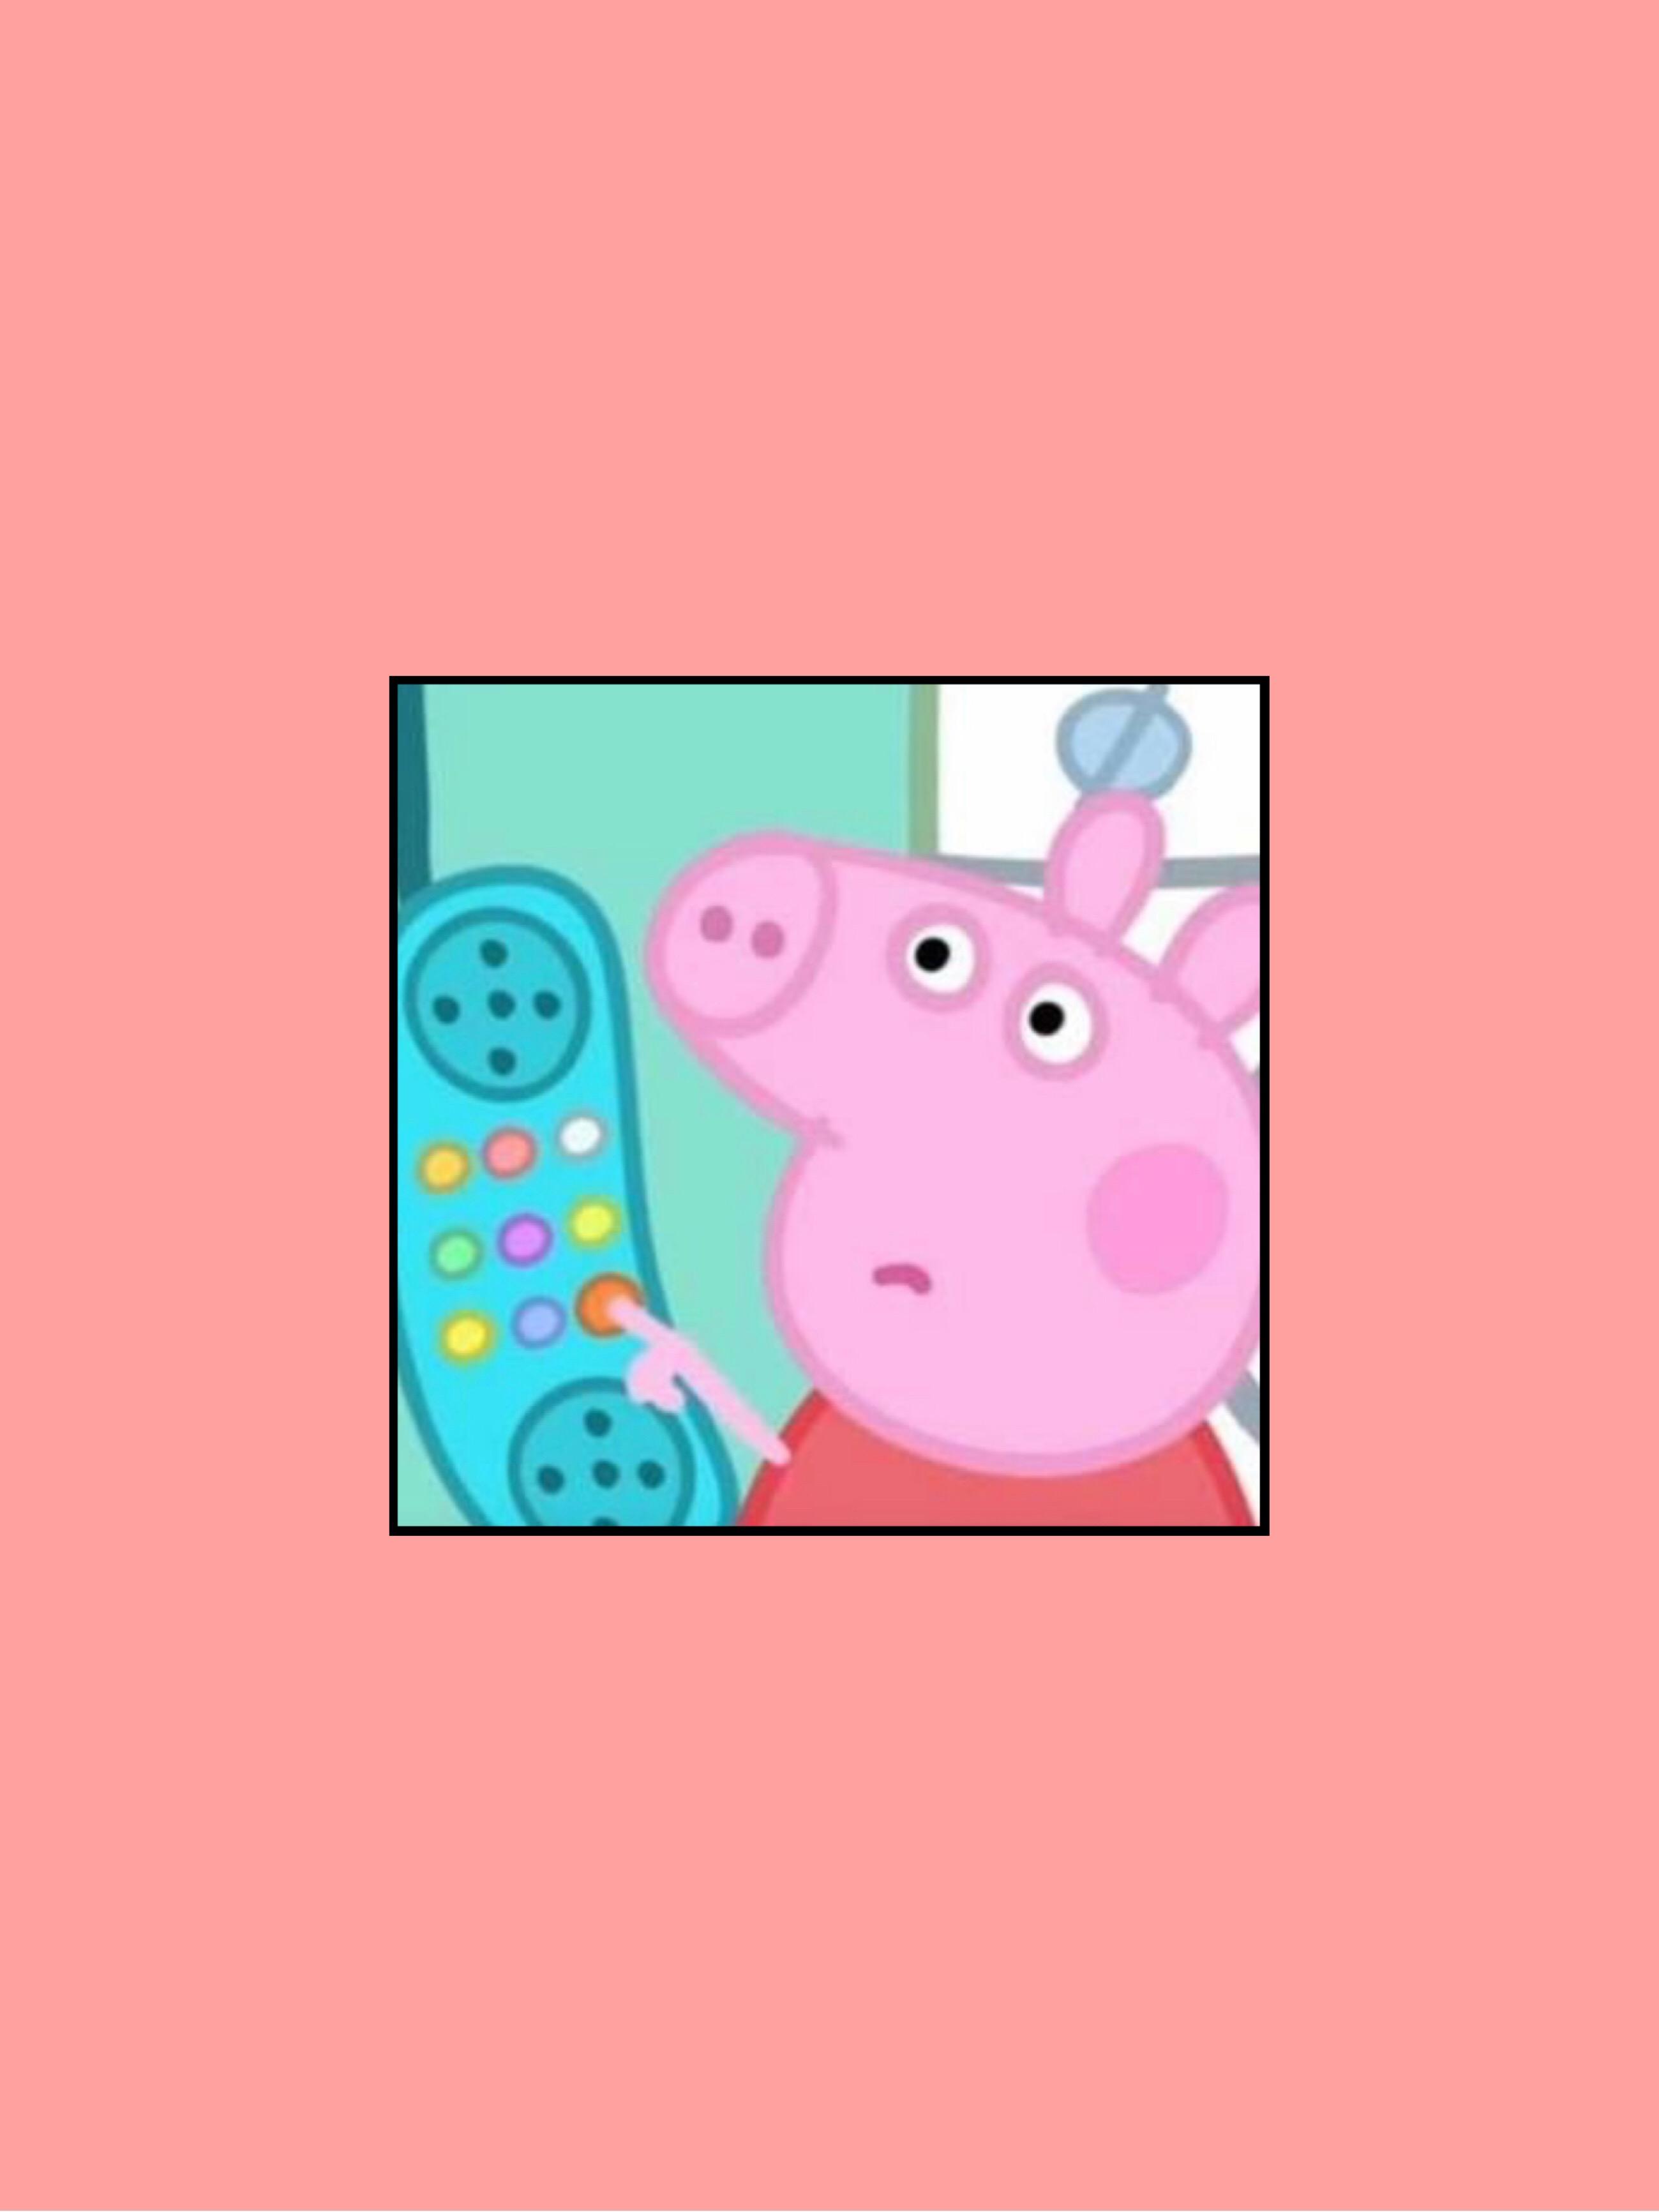 Peppa Pig Wallpaper Pink Pattern Wrapping Paper Design Textile Clip Art Animal Figure Livestock 1359893 Wallpaperkiss